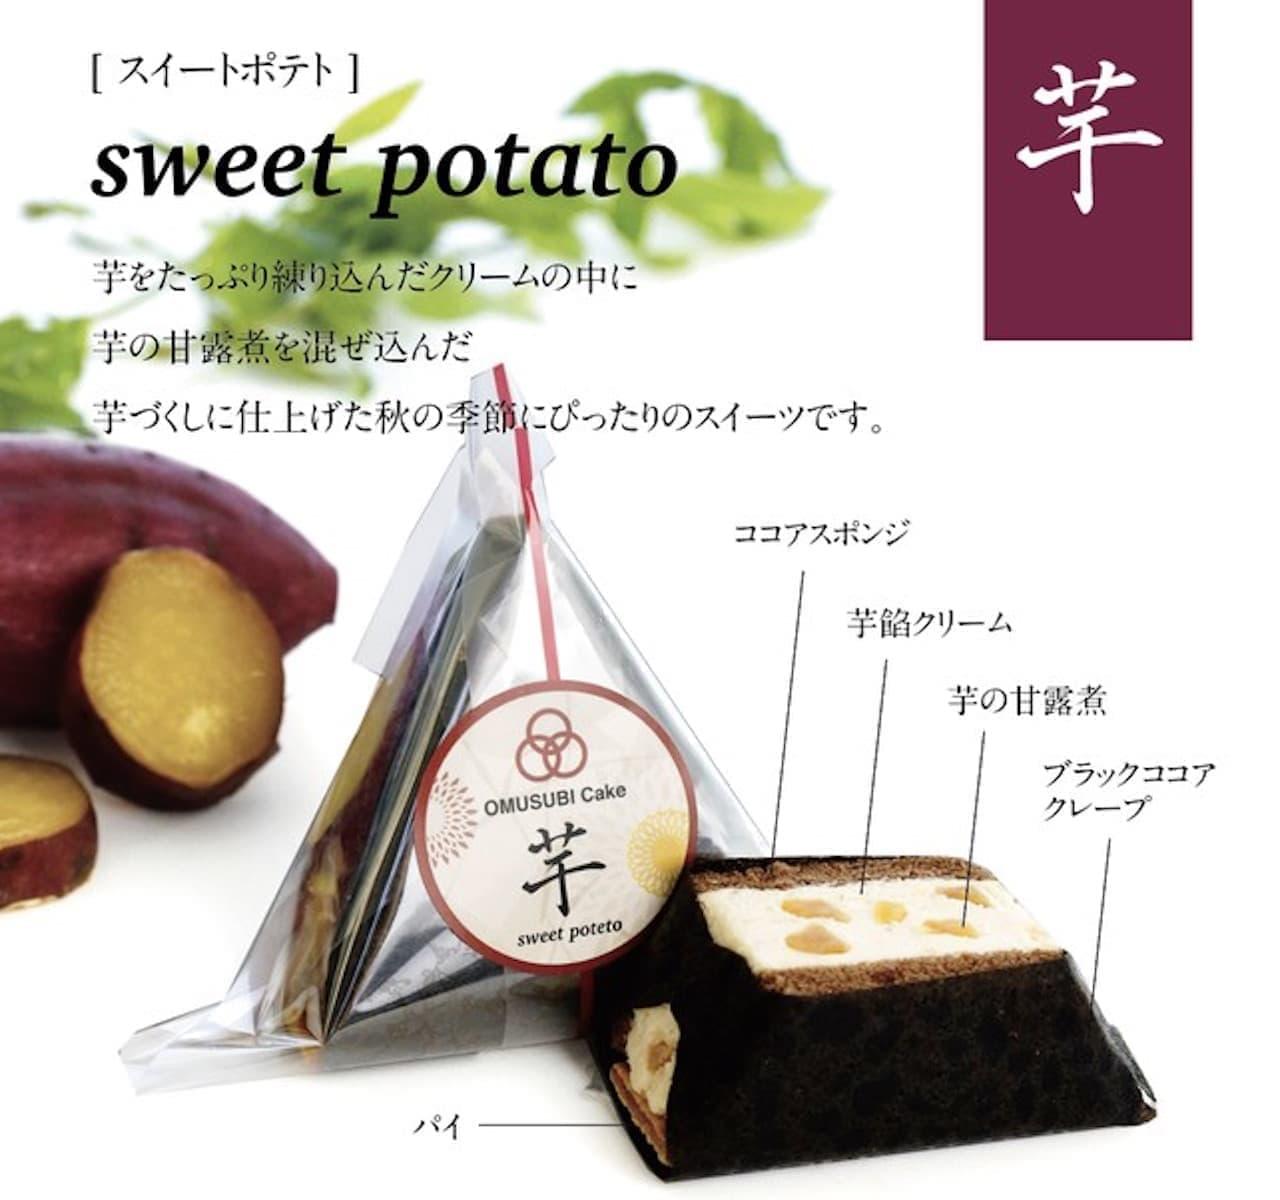 OMUSUBI Cake(おむすびケーキ)の秋の新作「芋」期間限定で